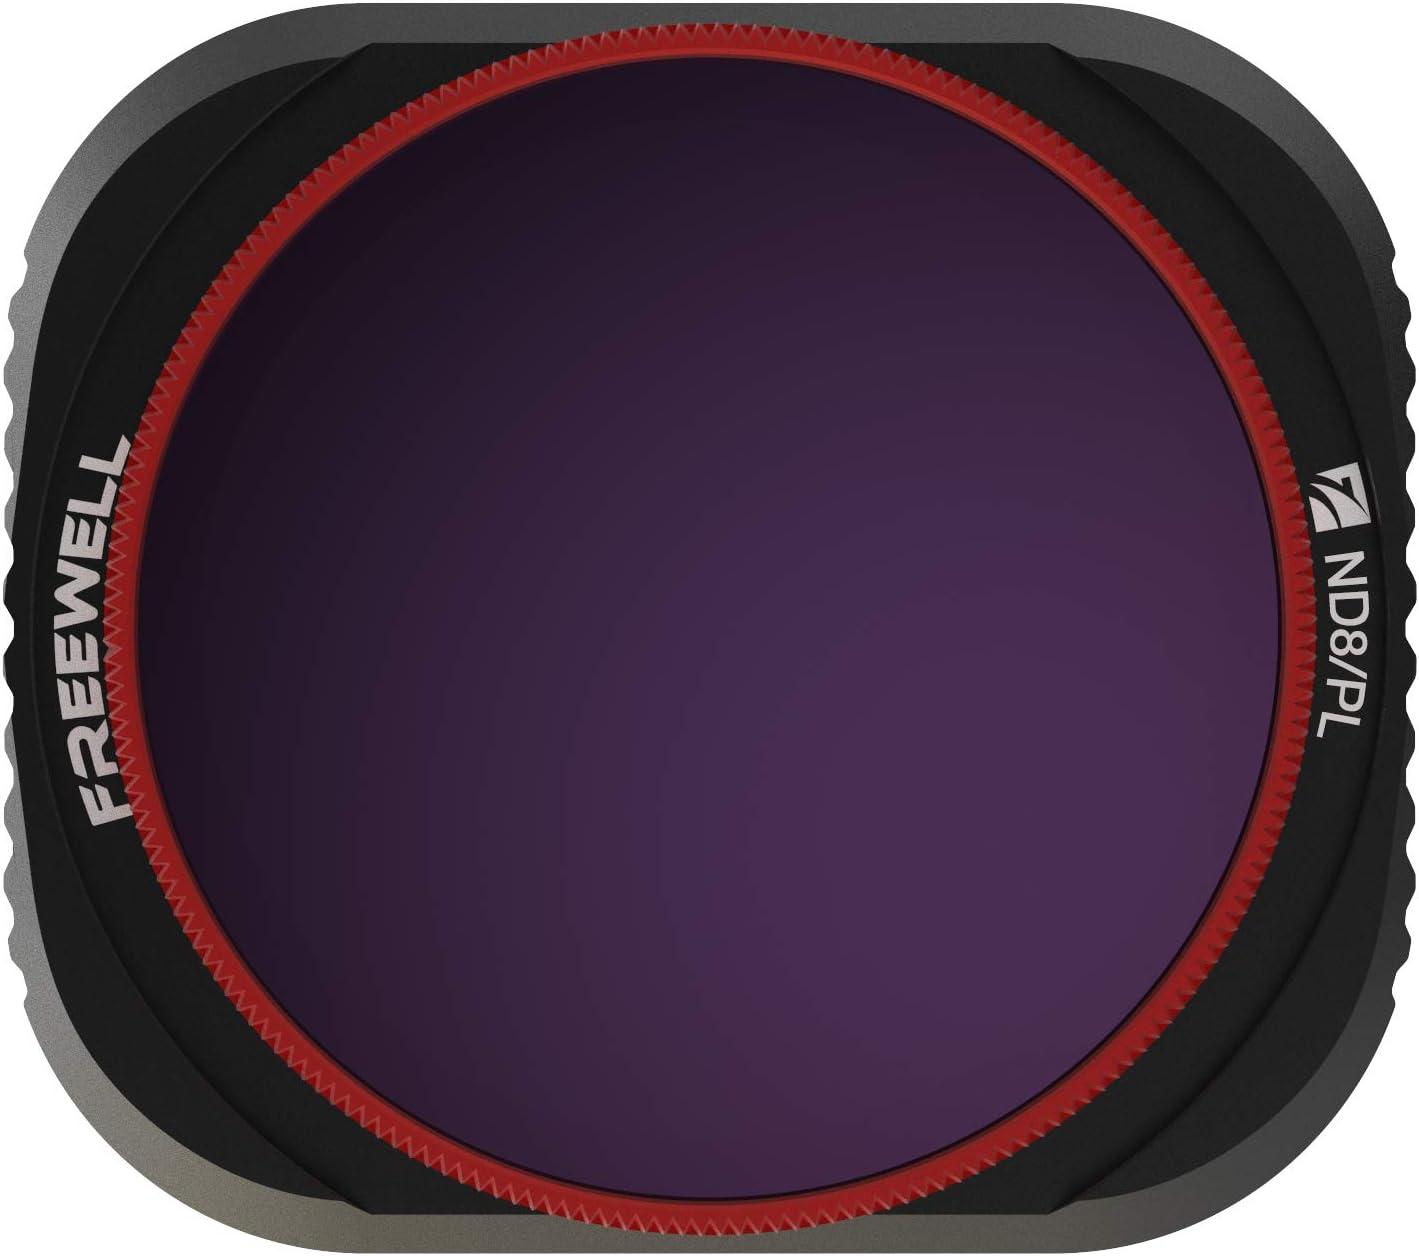 Freewell Nd8 Pl Hybridkamera Objektivlinse Kompatibel Kamera